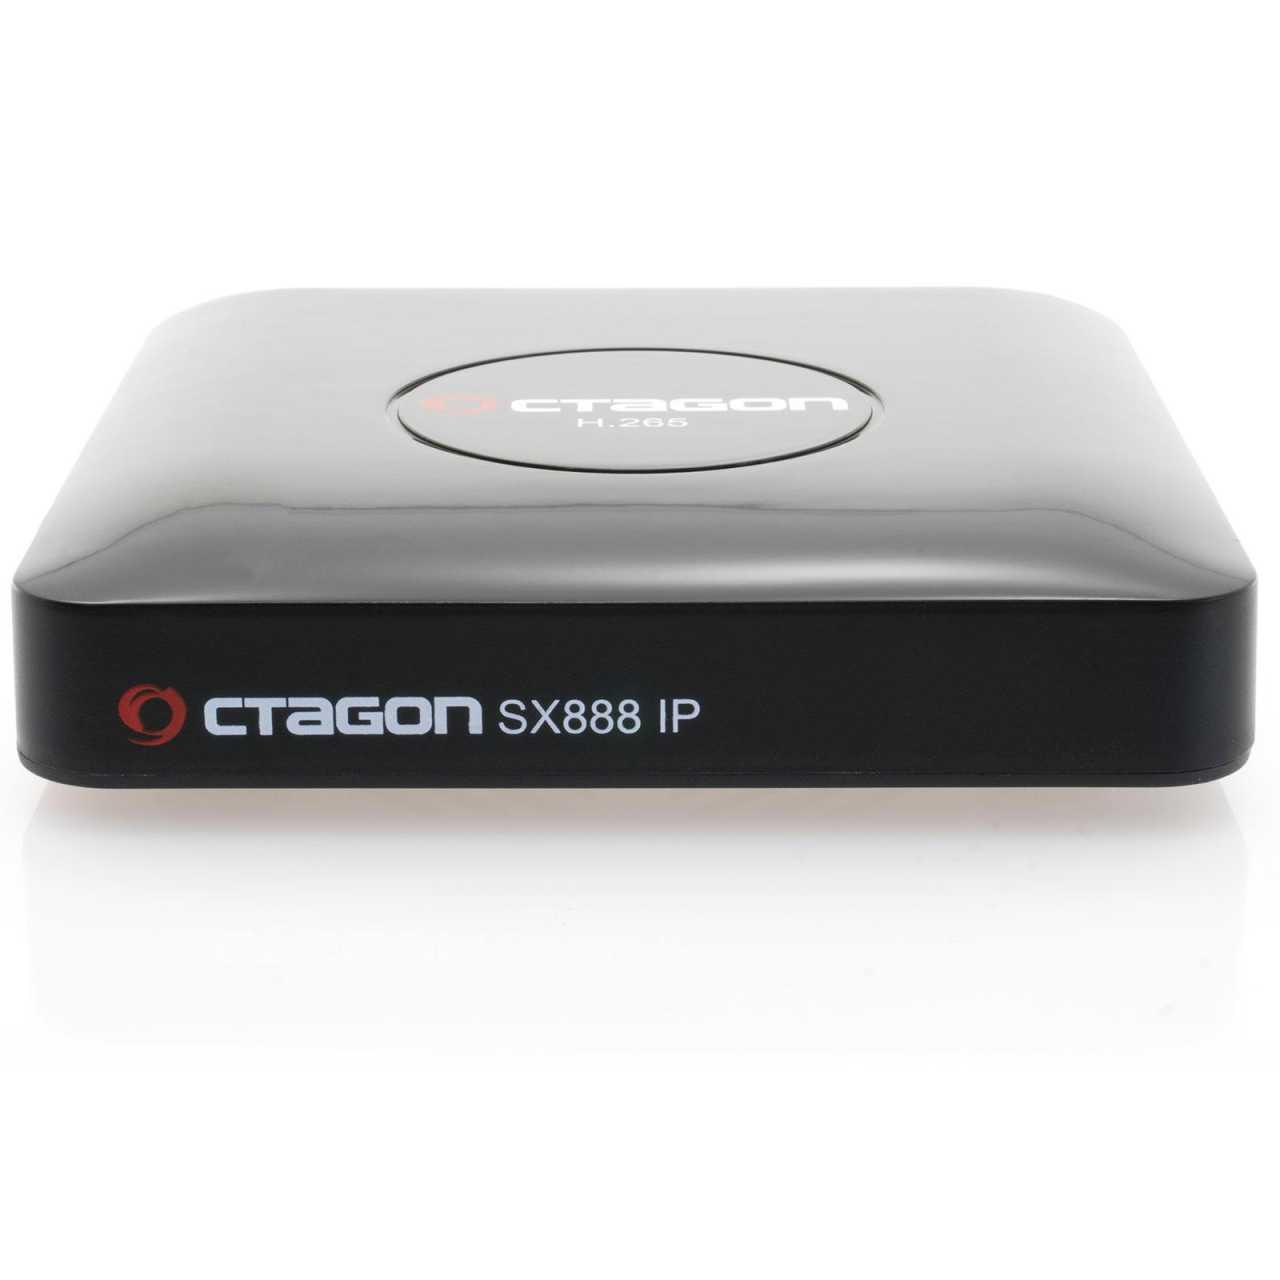 Octagon SX888 IP HEVC Full HD LAN USB H.265 TV IP m3u VOD Multimedia Box Wlan Stick RECOCT093